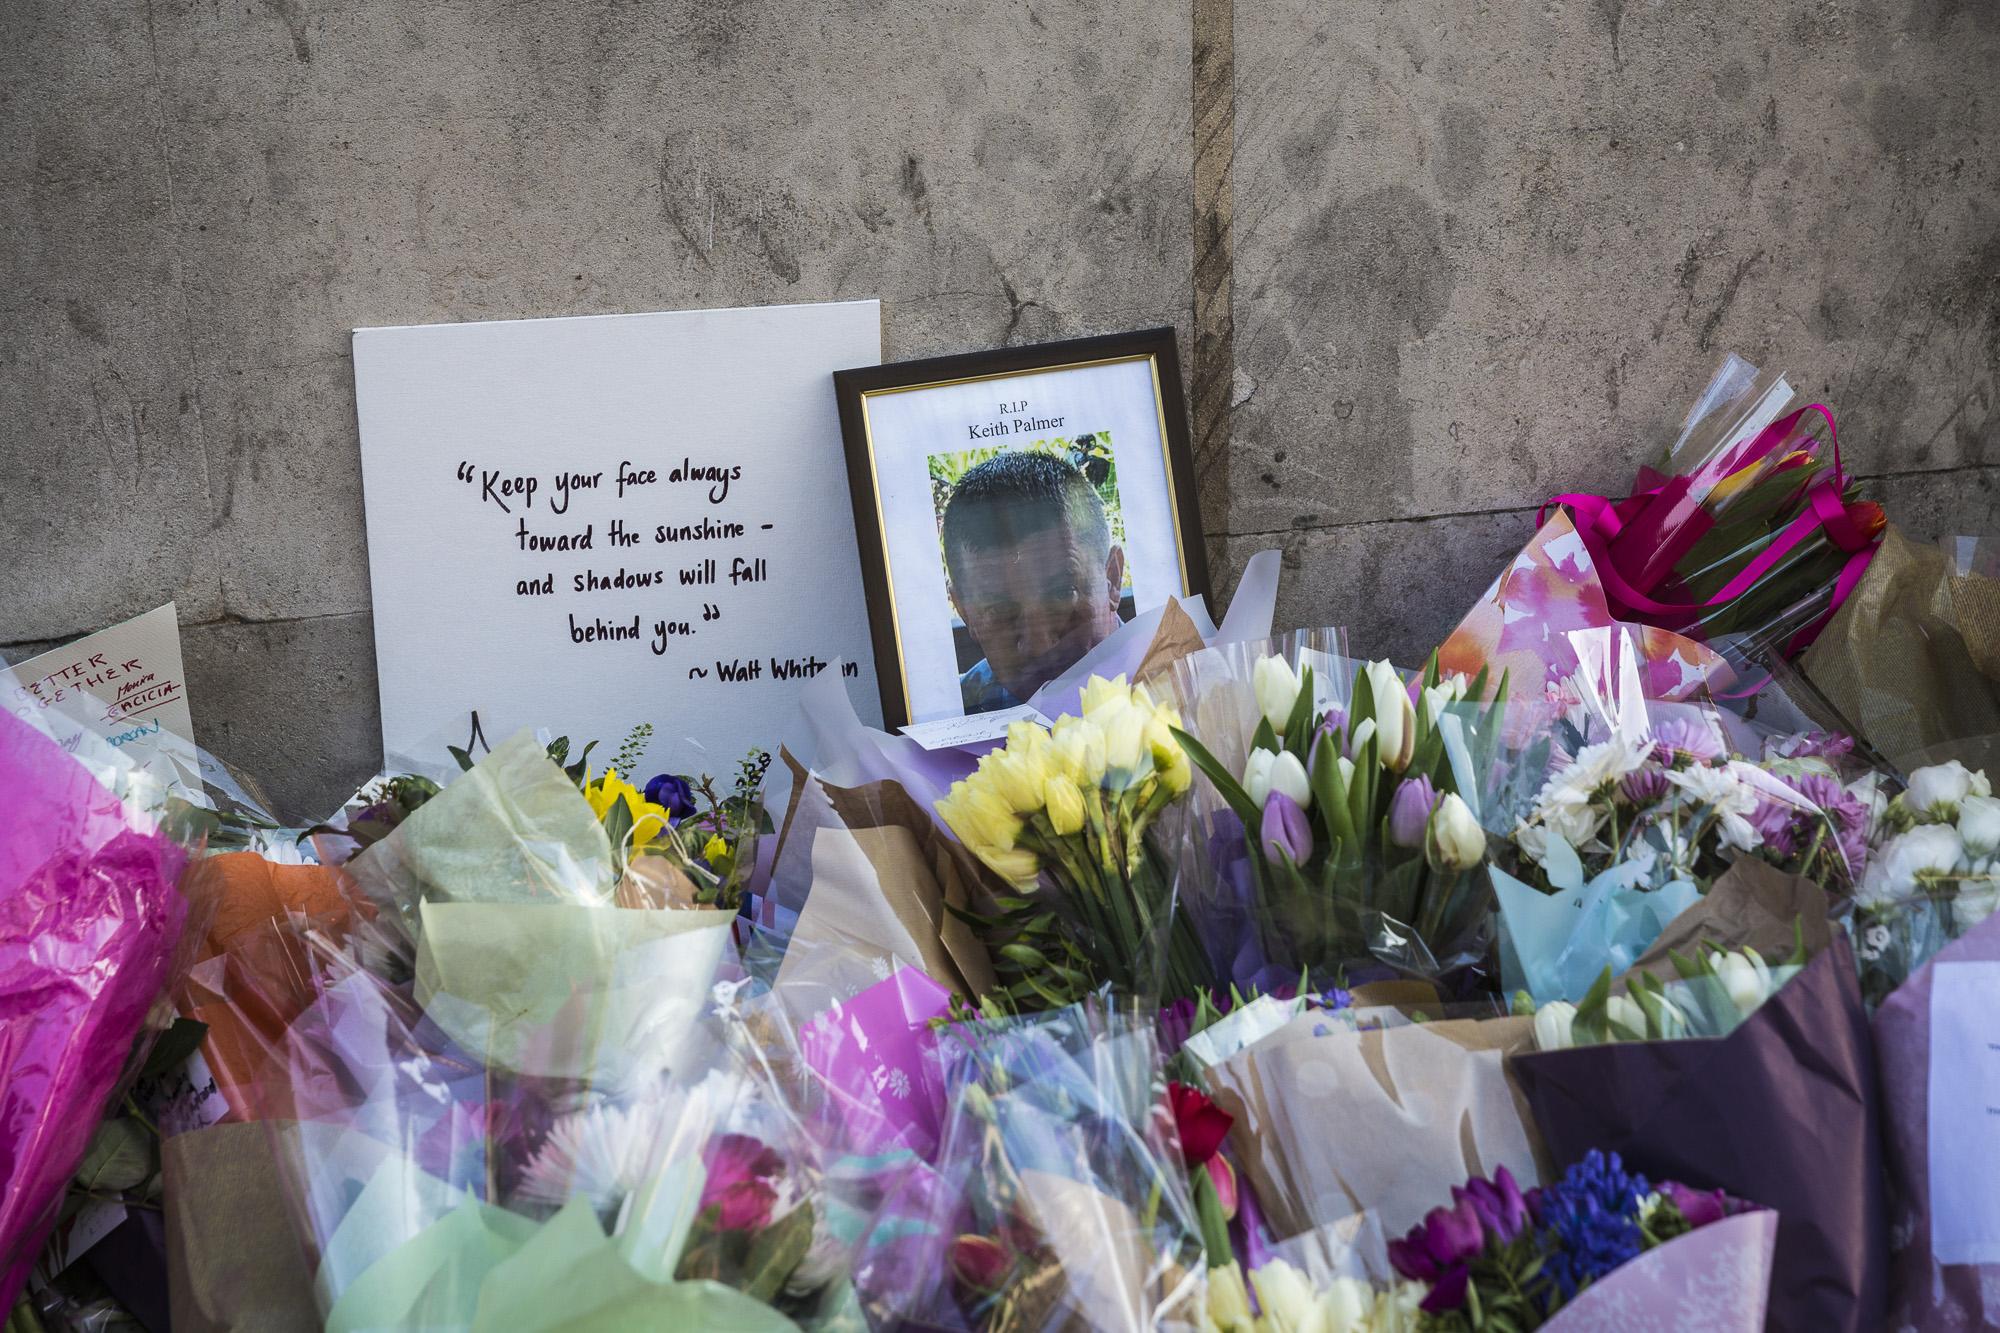 London_Attack_Hope_Not_Hate-25.jpg